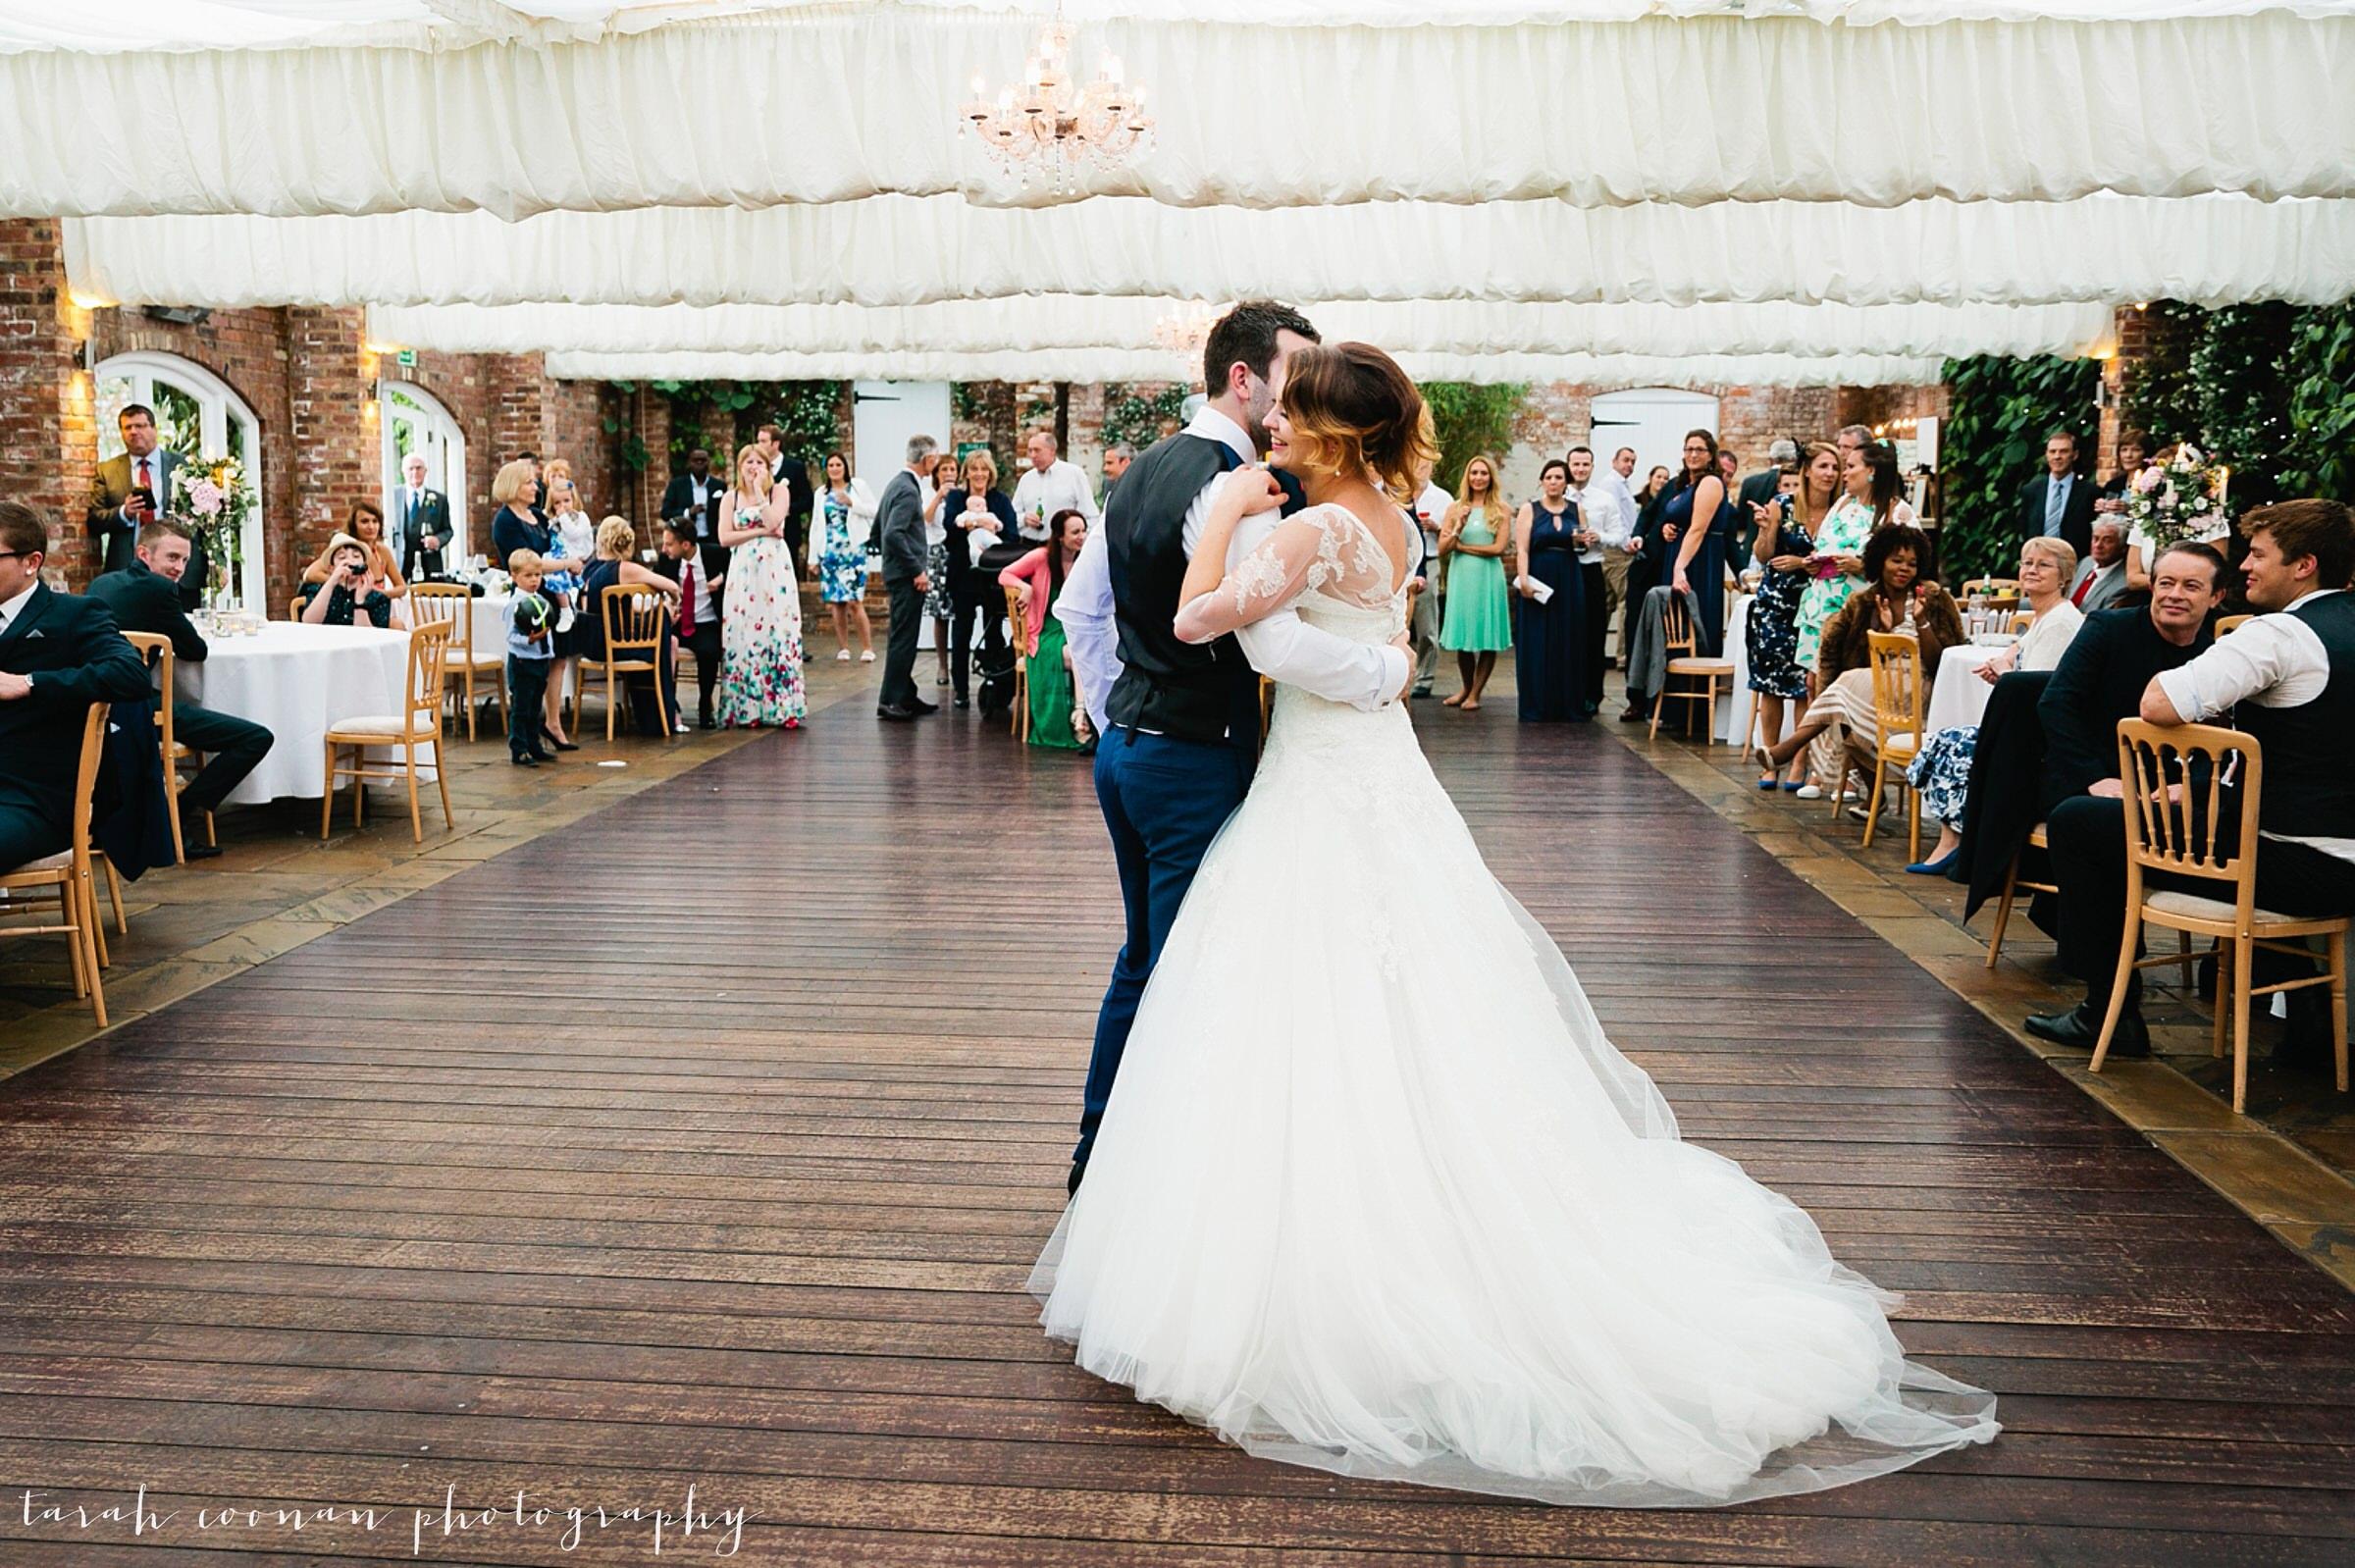 northbrook-park-wedding-photographer_098